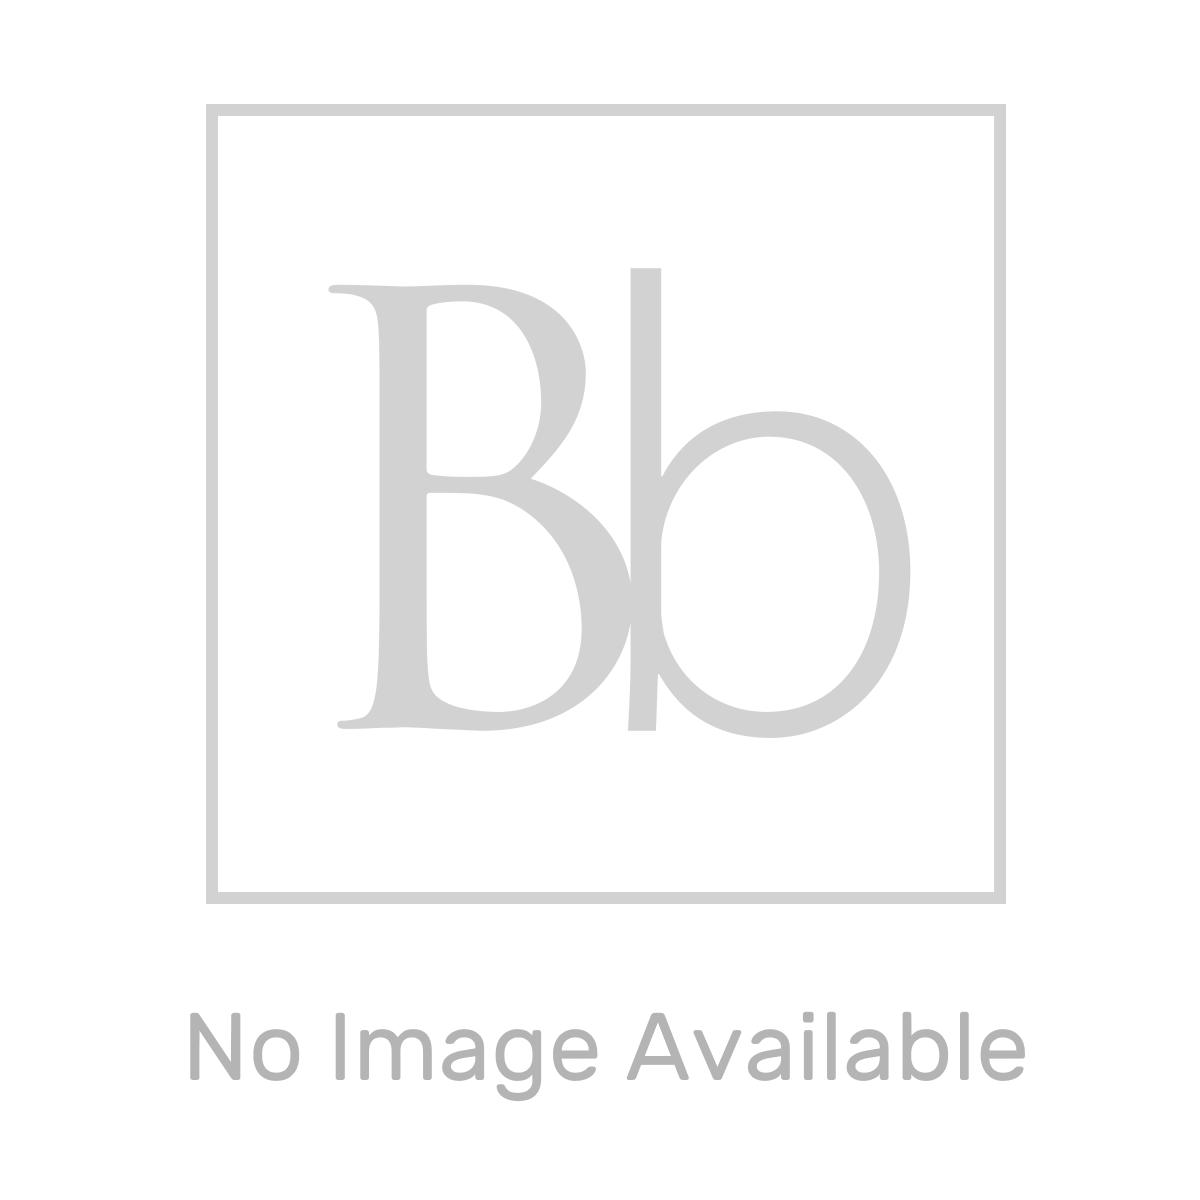 Aquadart Wet Room 10 Copper Wetroom Shower Enclosure with Optional Side Panel